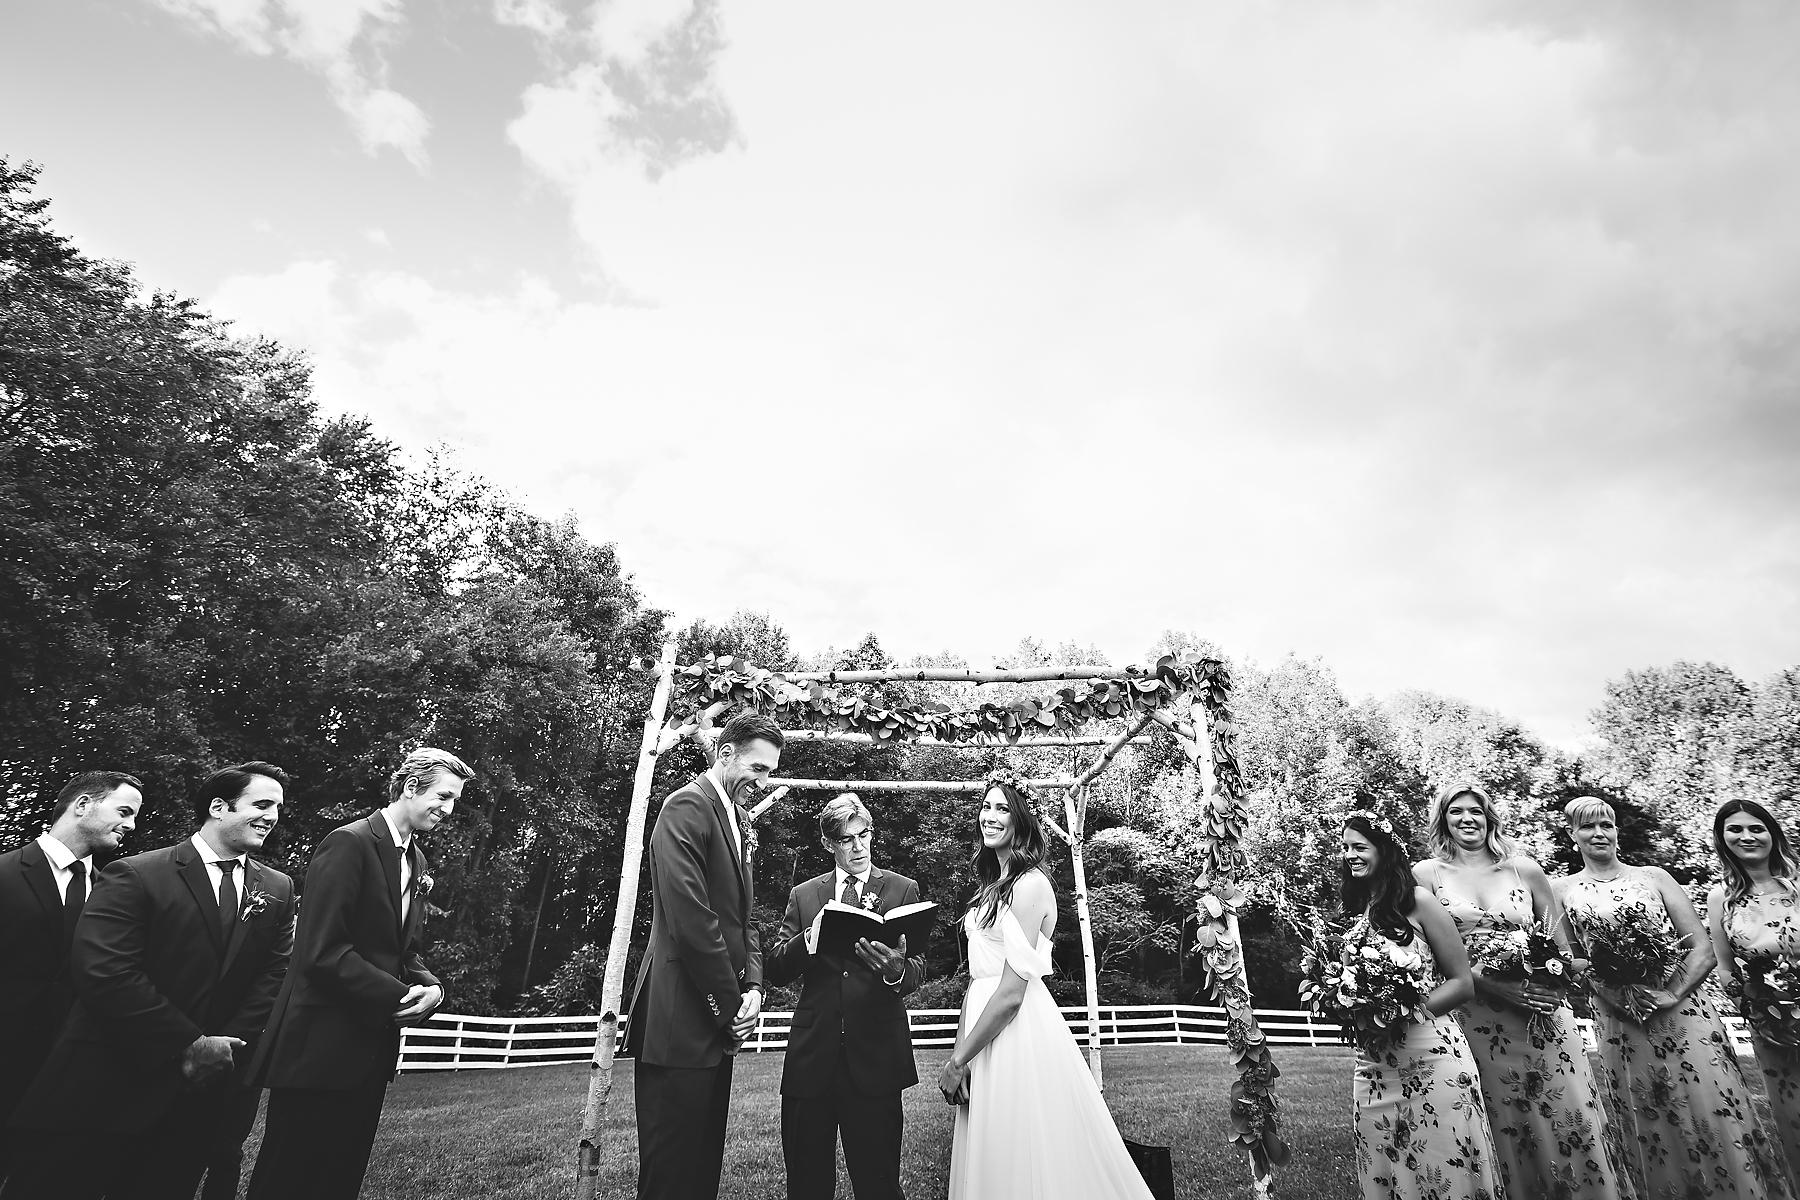 Barn at liberty farms wedding - 033.JPG